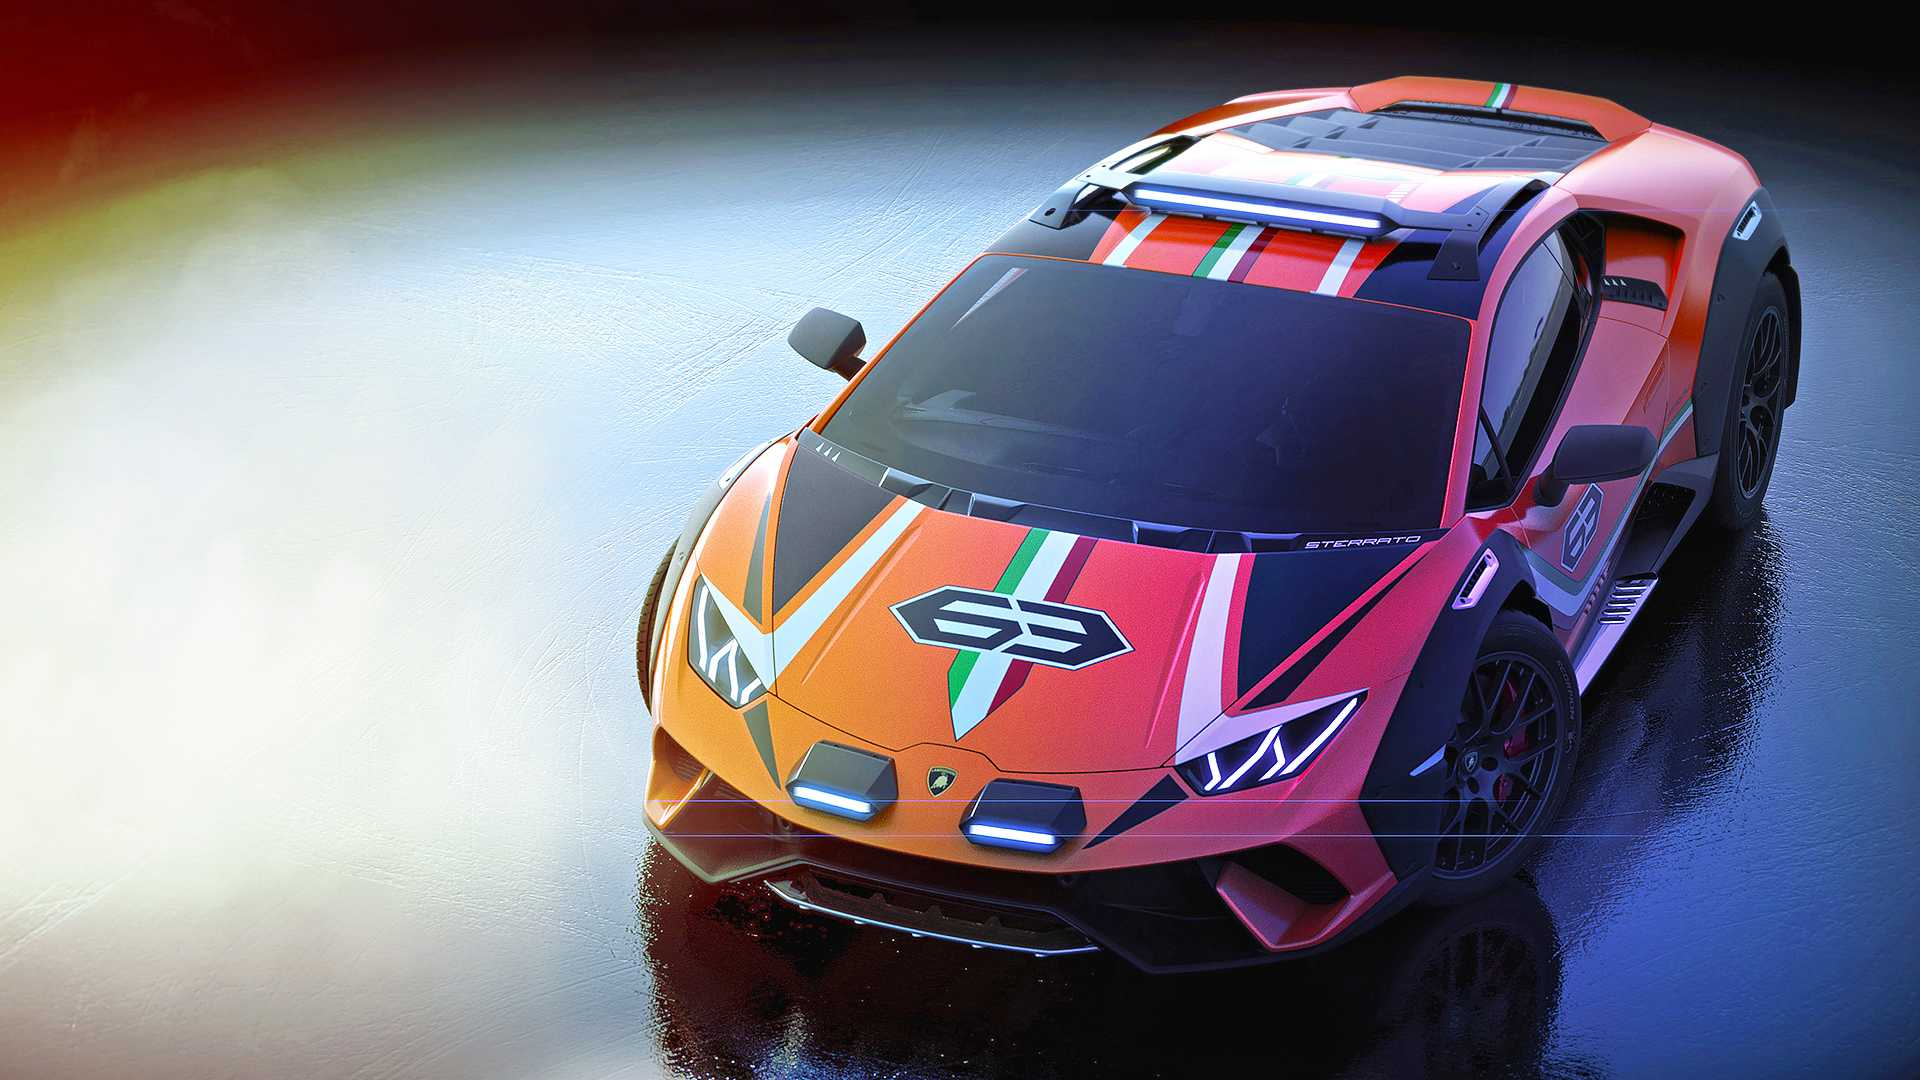 2019 Lamborghini Huracán Sterrato Concept Front Wallpapers #4 of 7